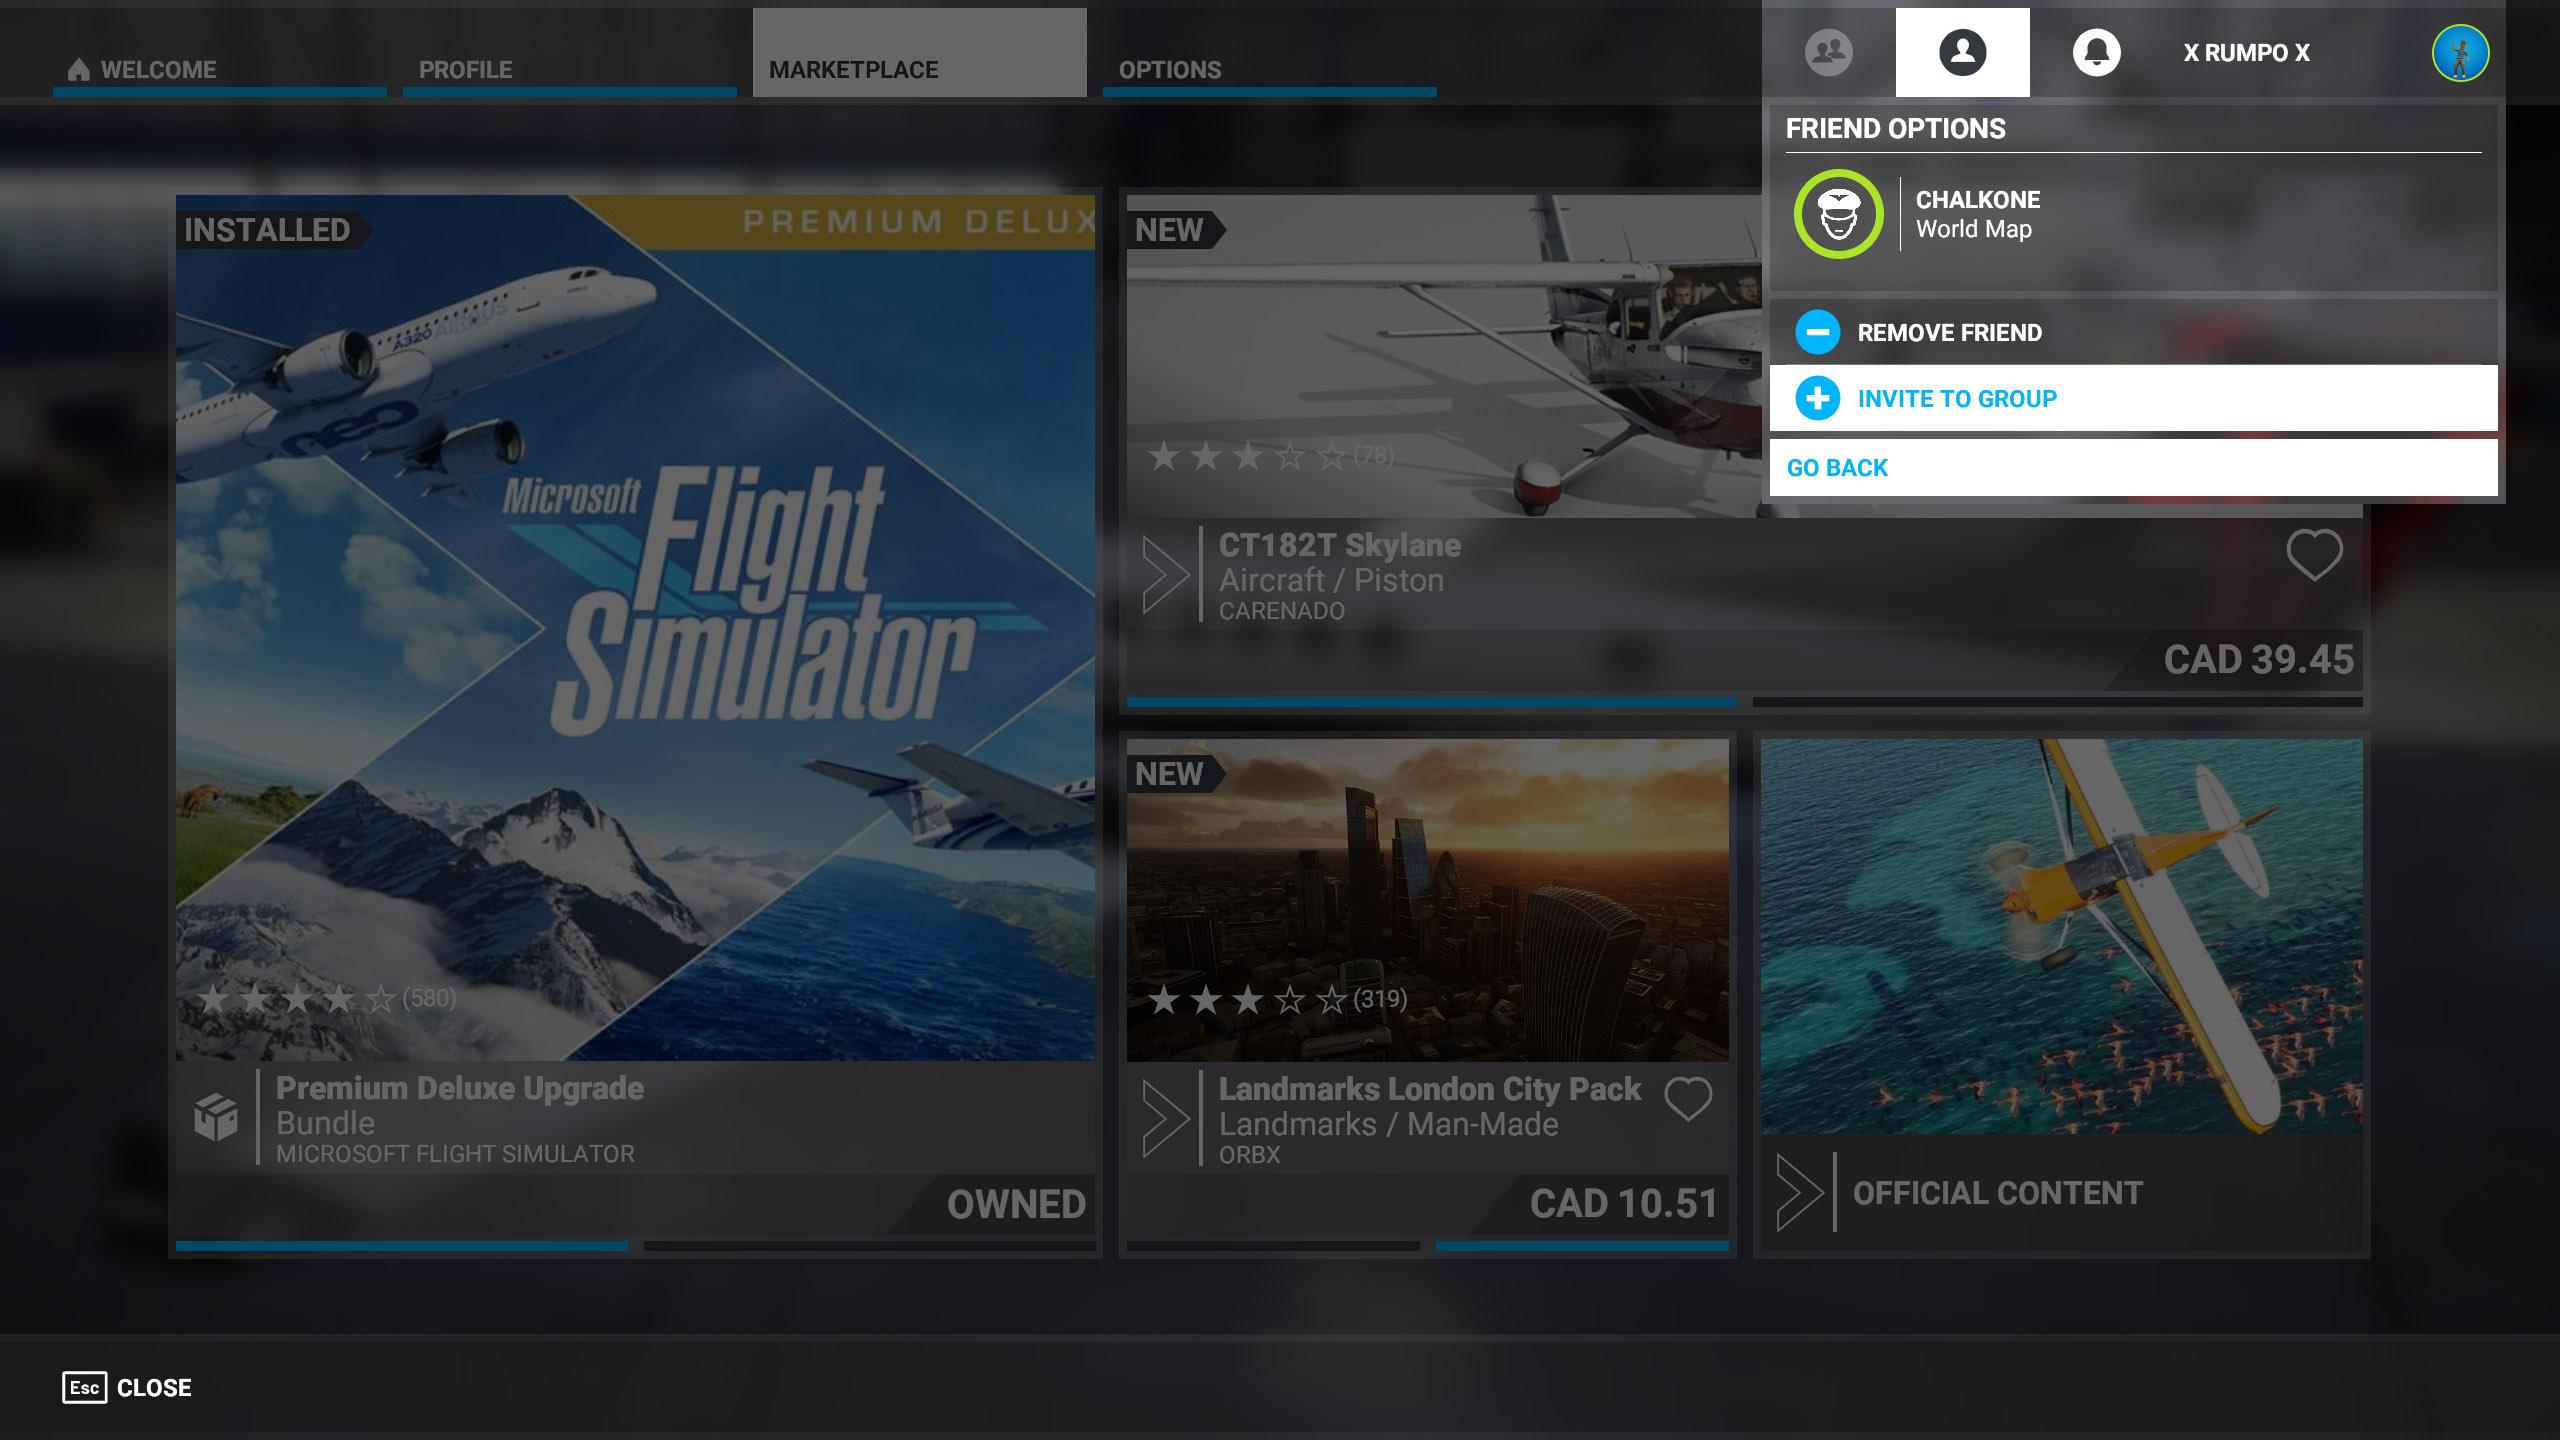 Play Friends Microsoft Flight Simulator 2020